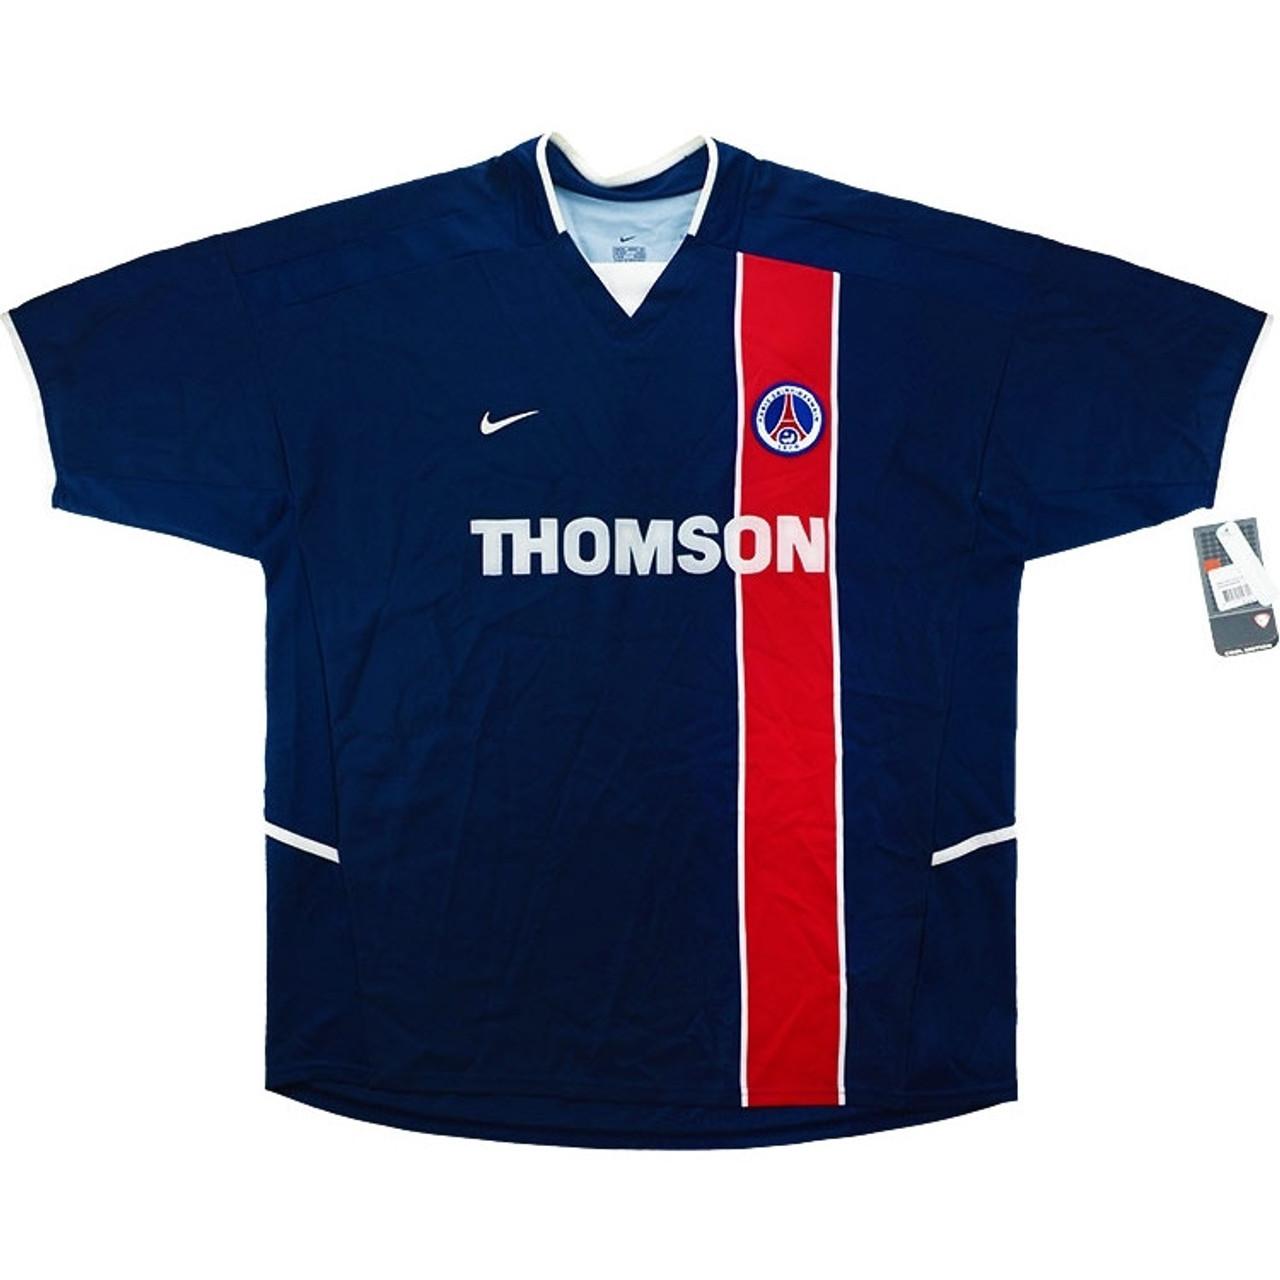 61f6cbde295 NIKE PARIS SAINT-GERMAIN 2005 HOME `PAULETA` JERSEY - Soccer Plus